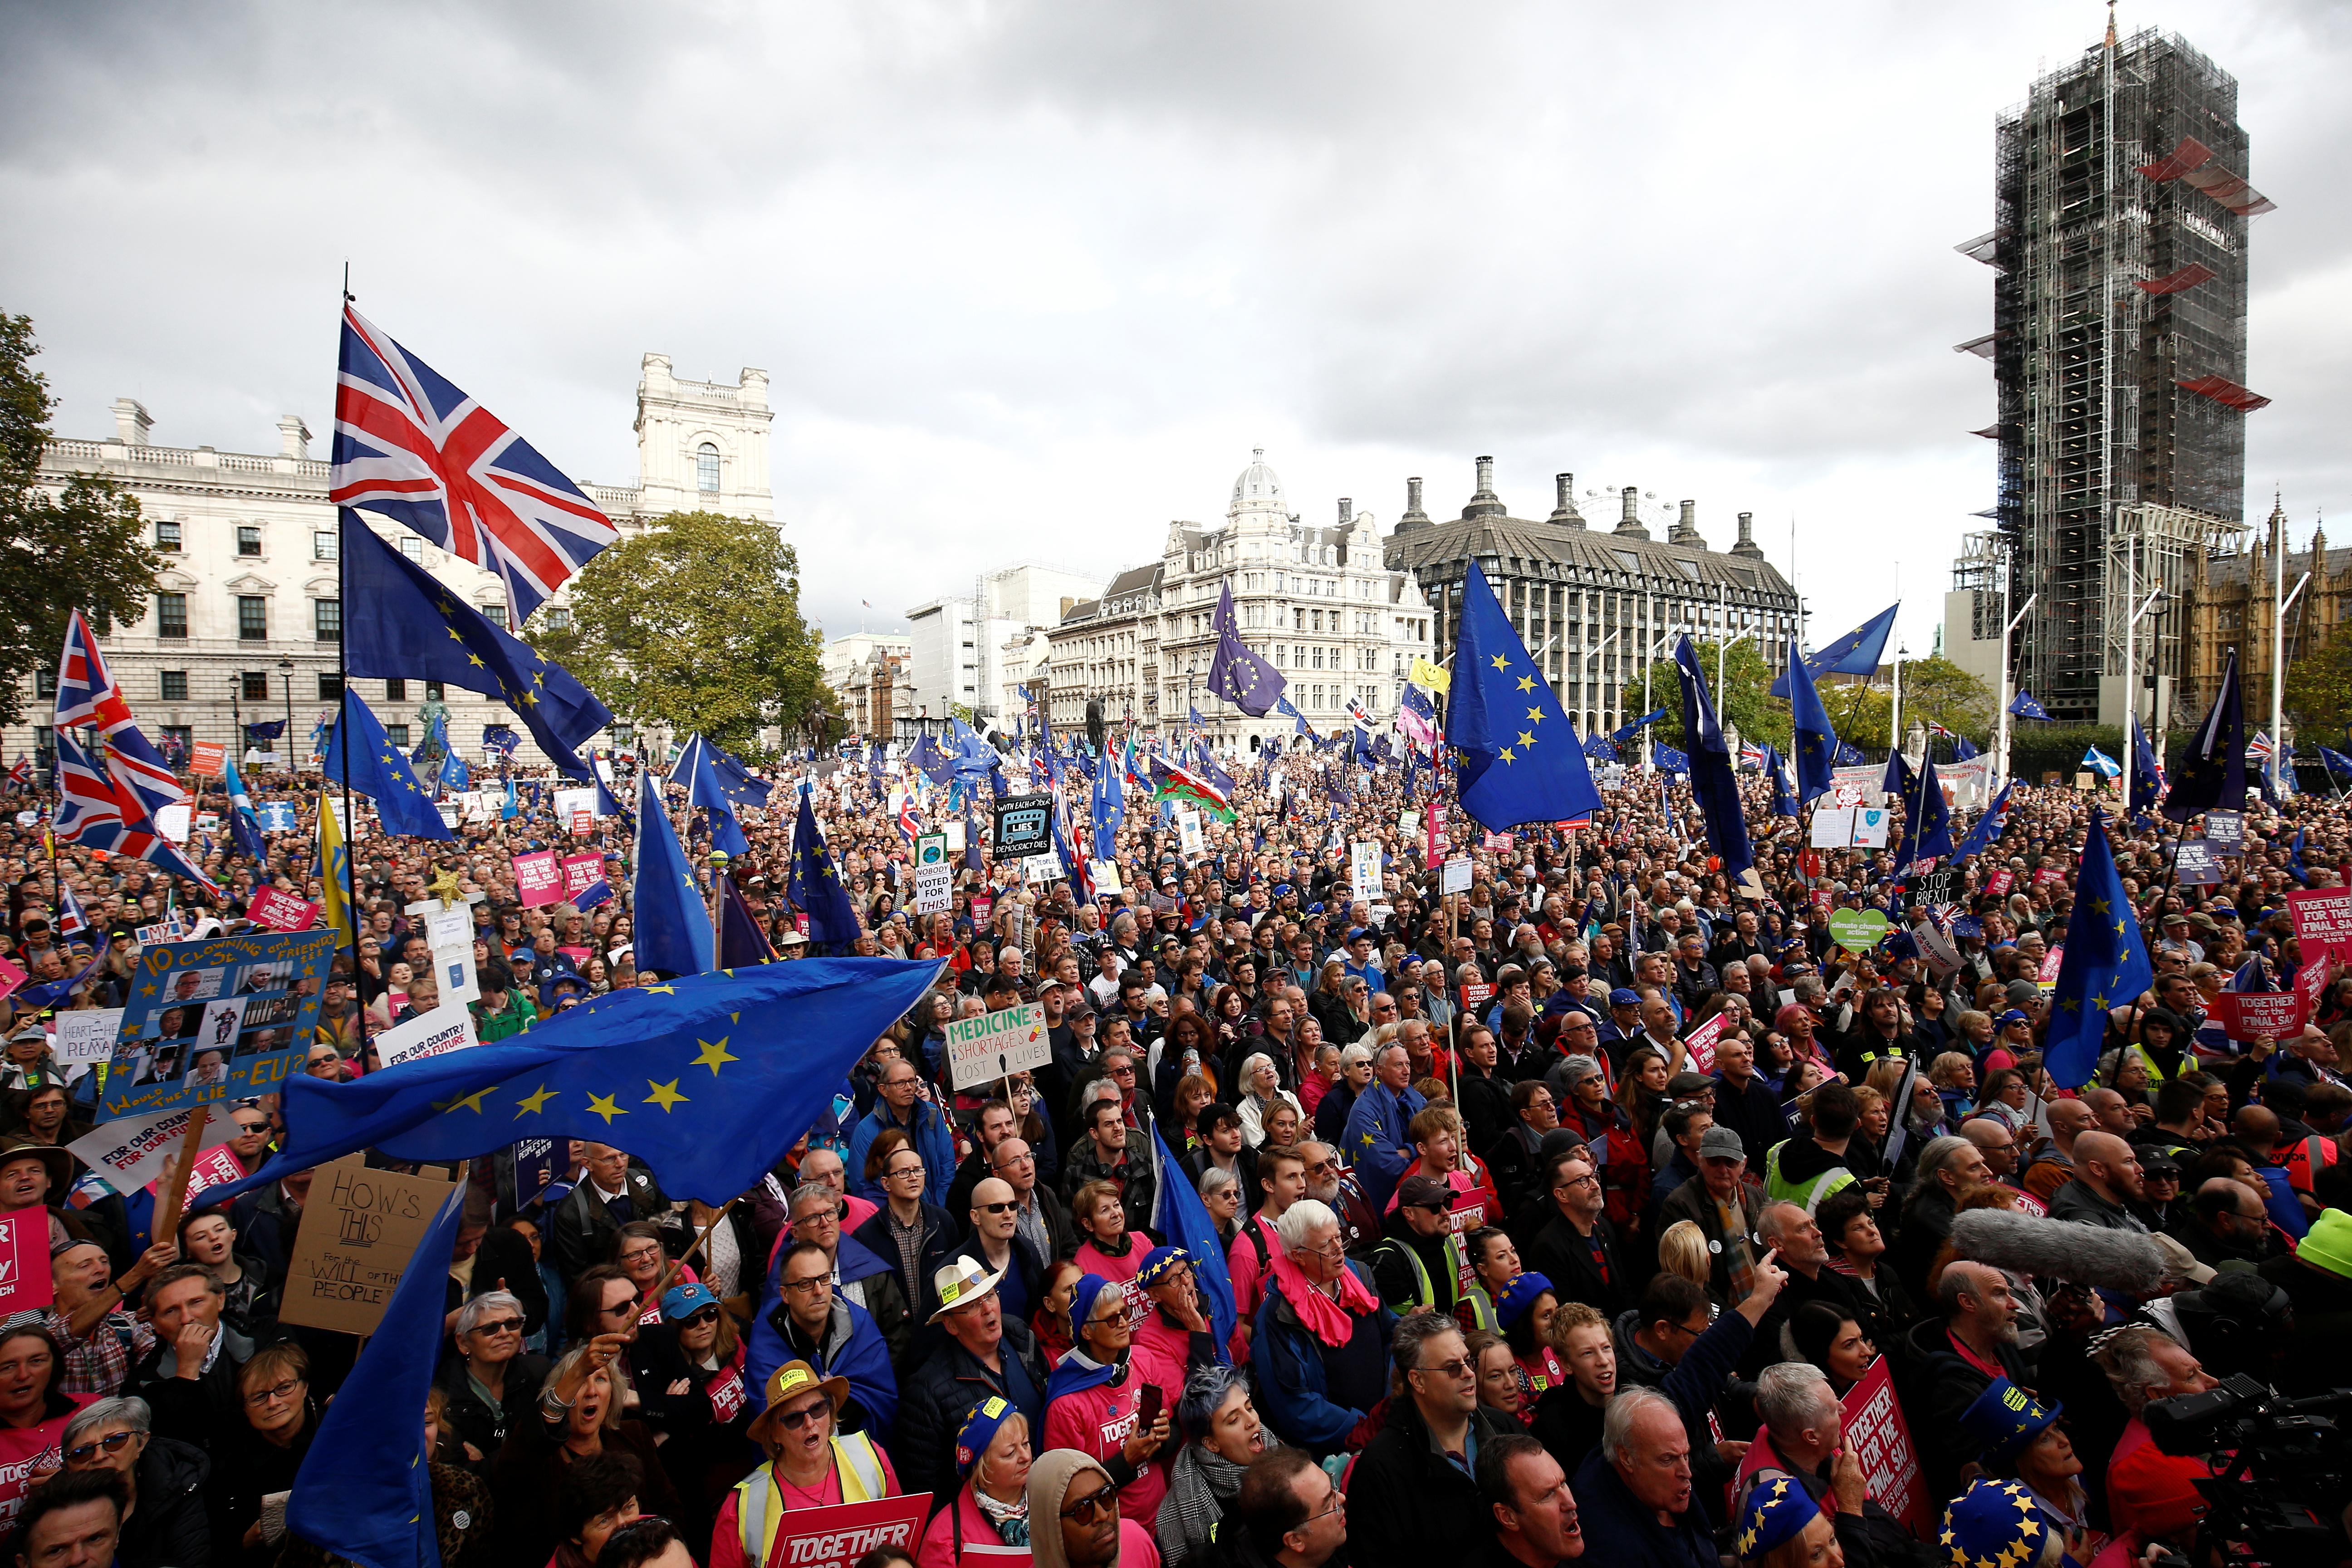 Brexit: Πρώτα θα ψηφιστεί στη Βουλή των Κοινοτήτων η συμφωνία και μετά στην Ευρωβουλή